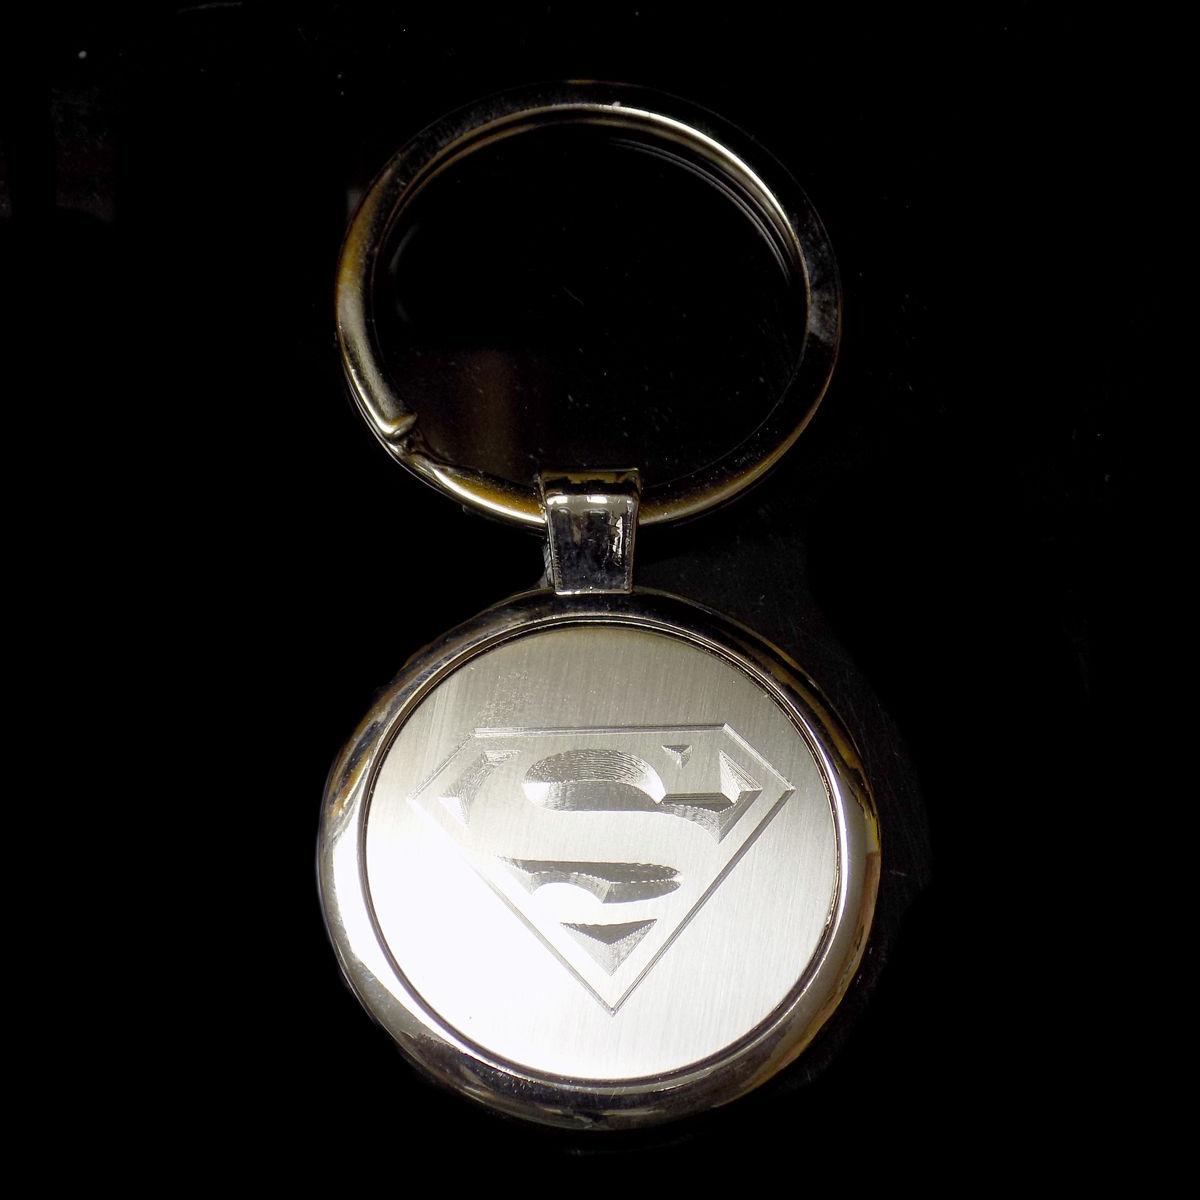 Superman Fill Design Keychain Key Chain Tag Engraved Silver Tone Metal KEN-0050